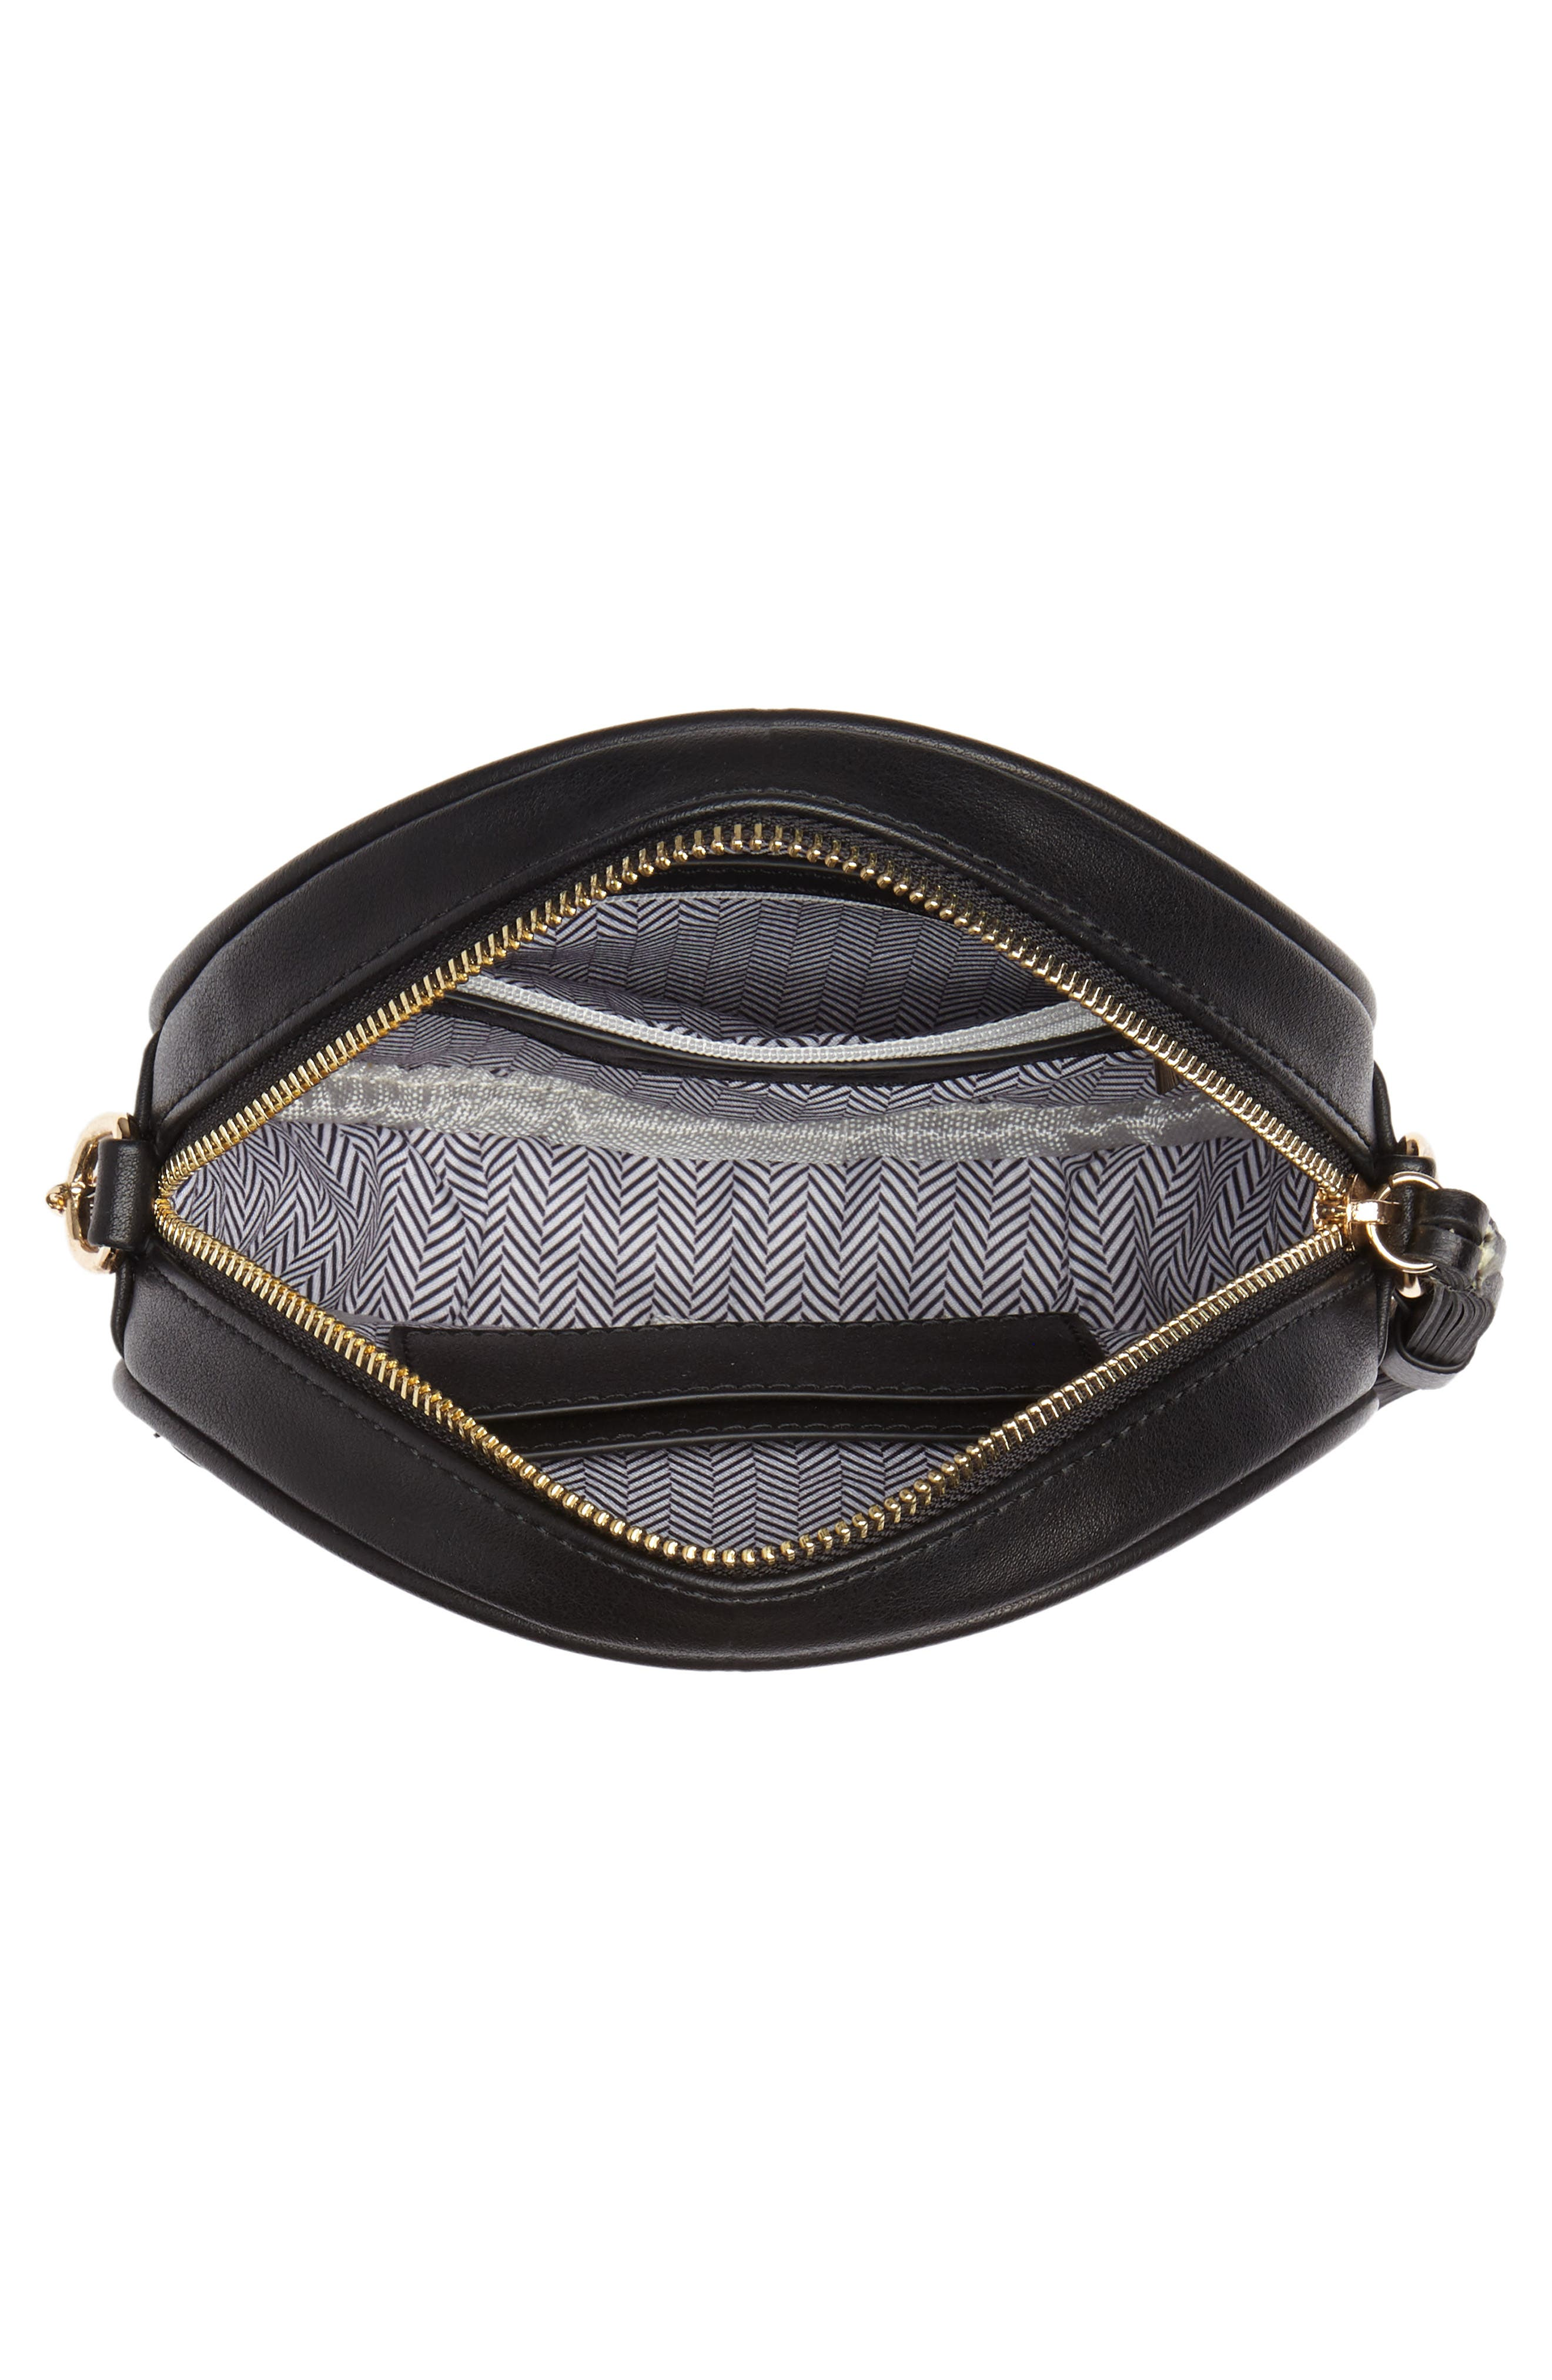 Mali + Lili Payton Vegan Leather Canteen Crossbody Bag,                             Alternate thumbnail 4, color,                             003